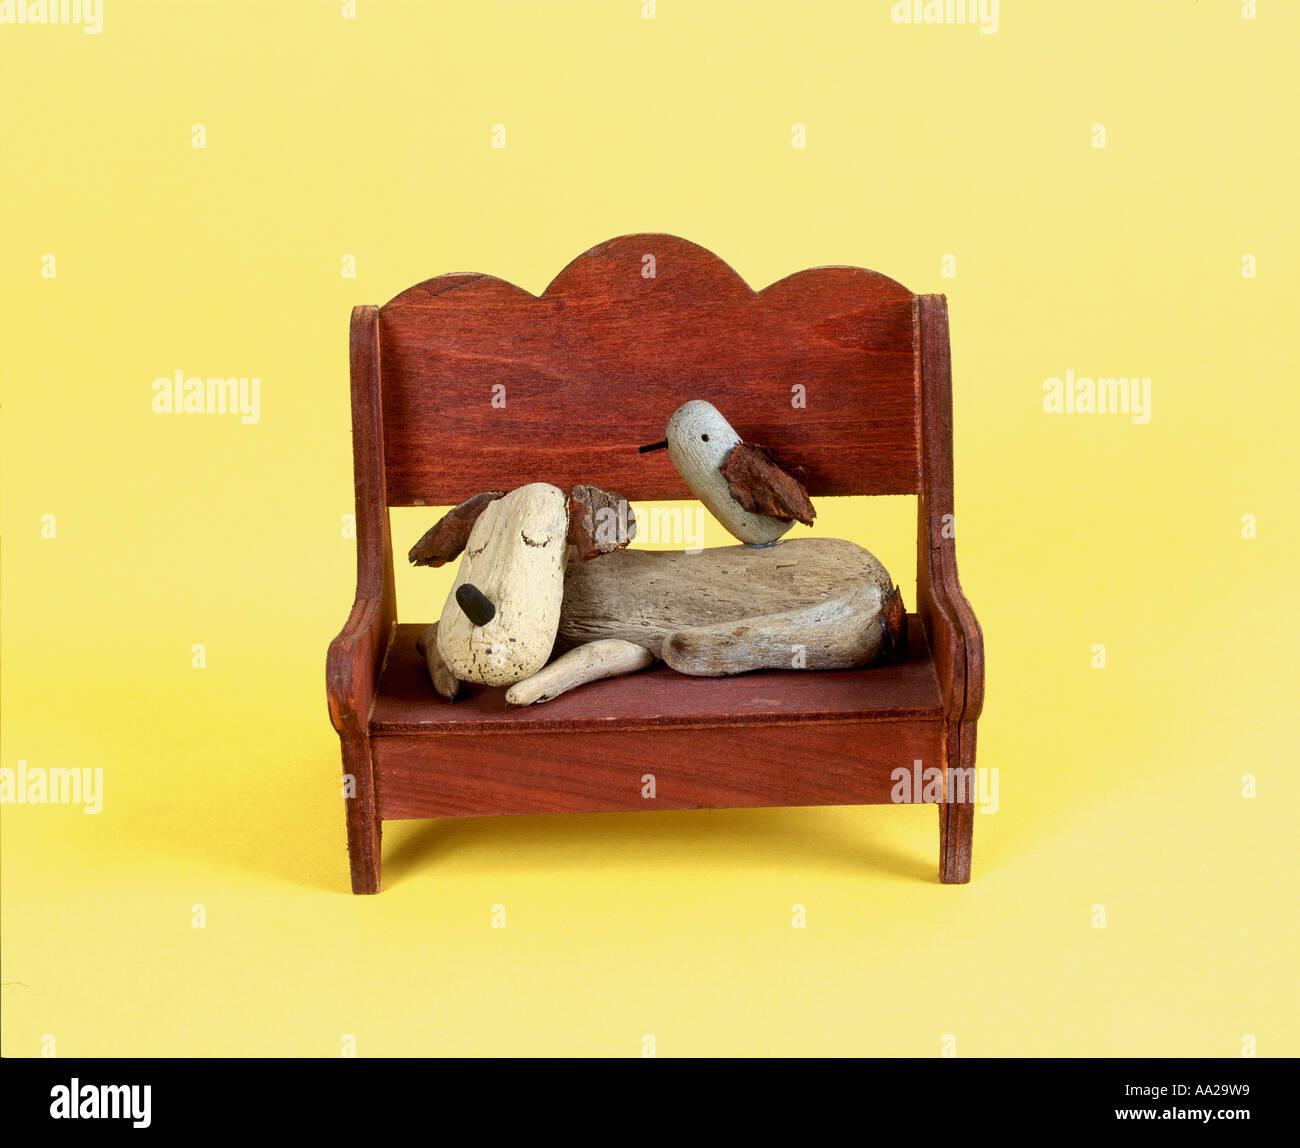 Illustration 3D Dog and Bird - Stock Image